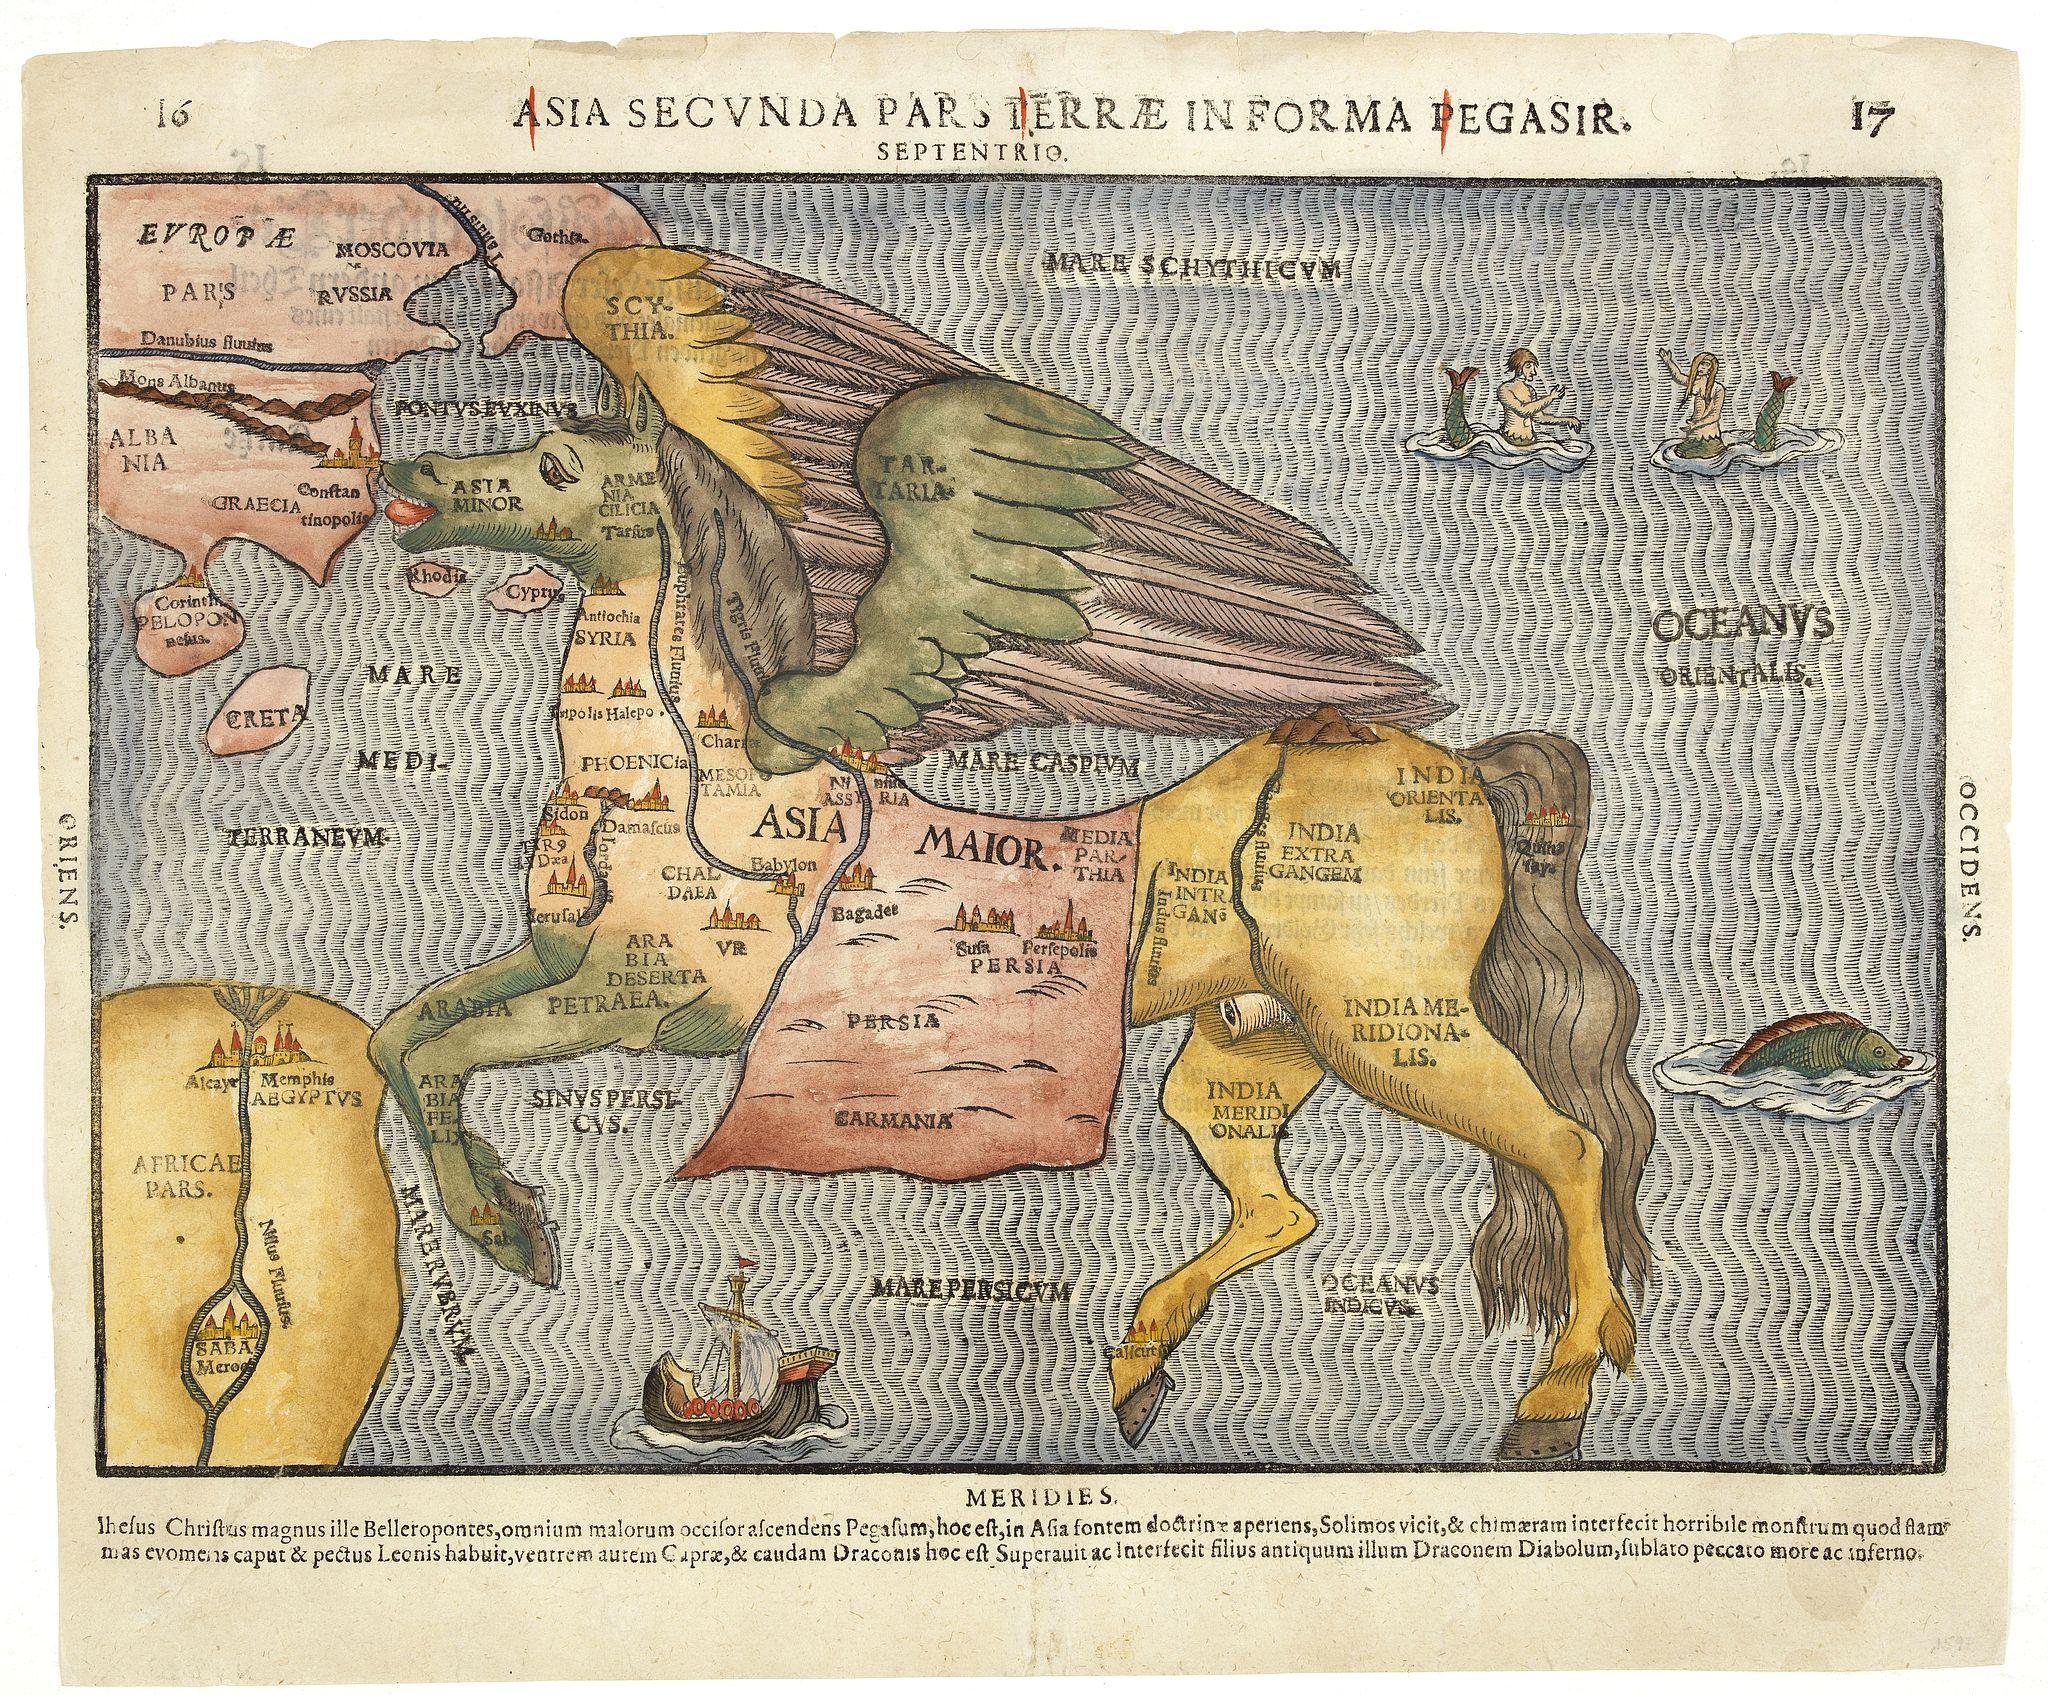 BÜNTING, H. -  Asia secunda pars terrae in forma Pegasi.